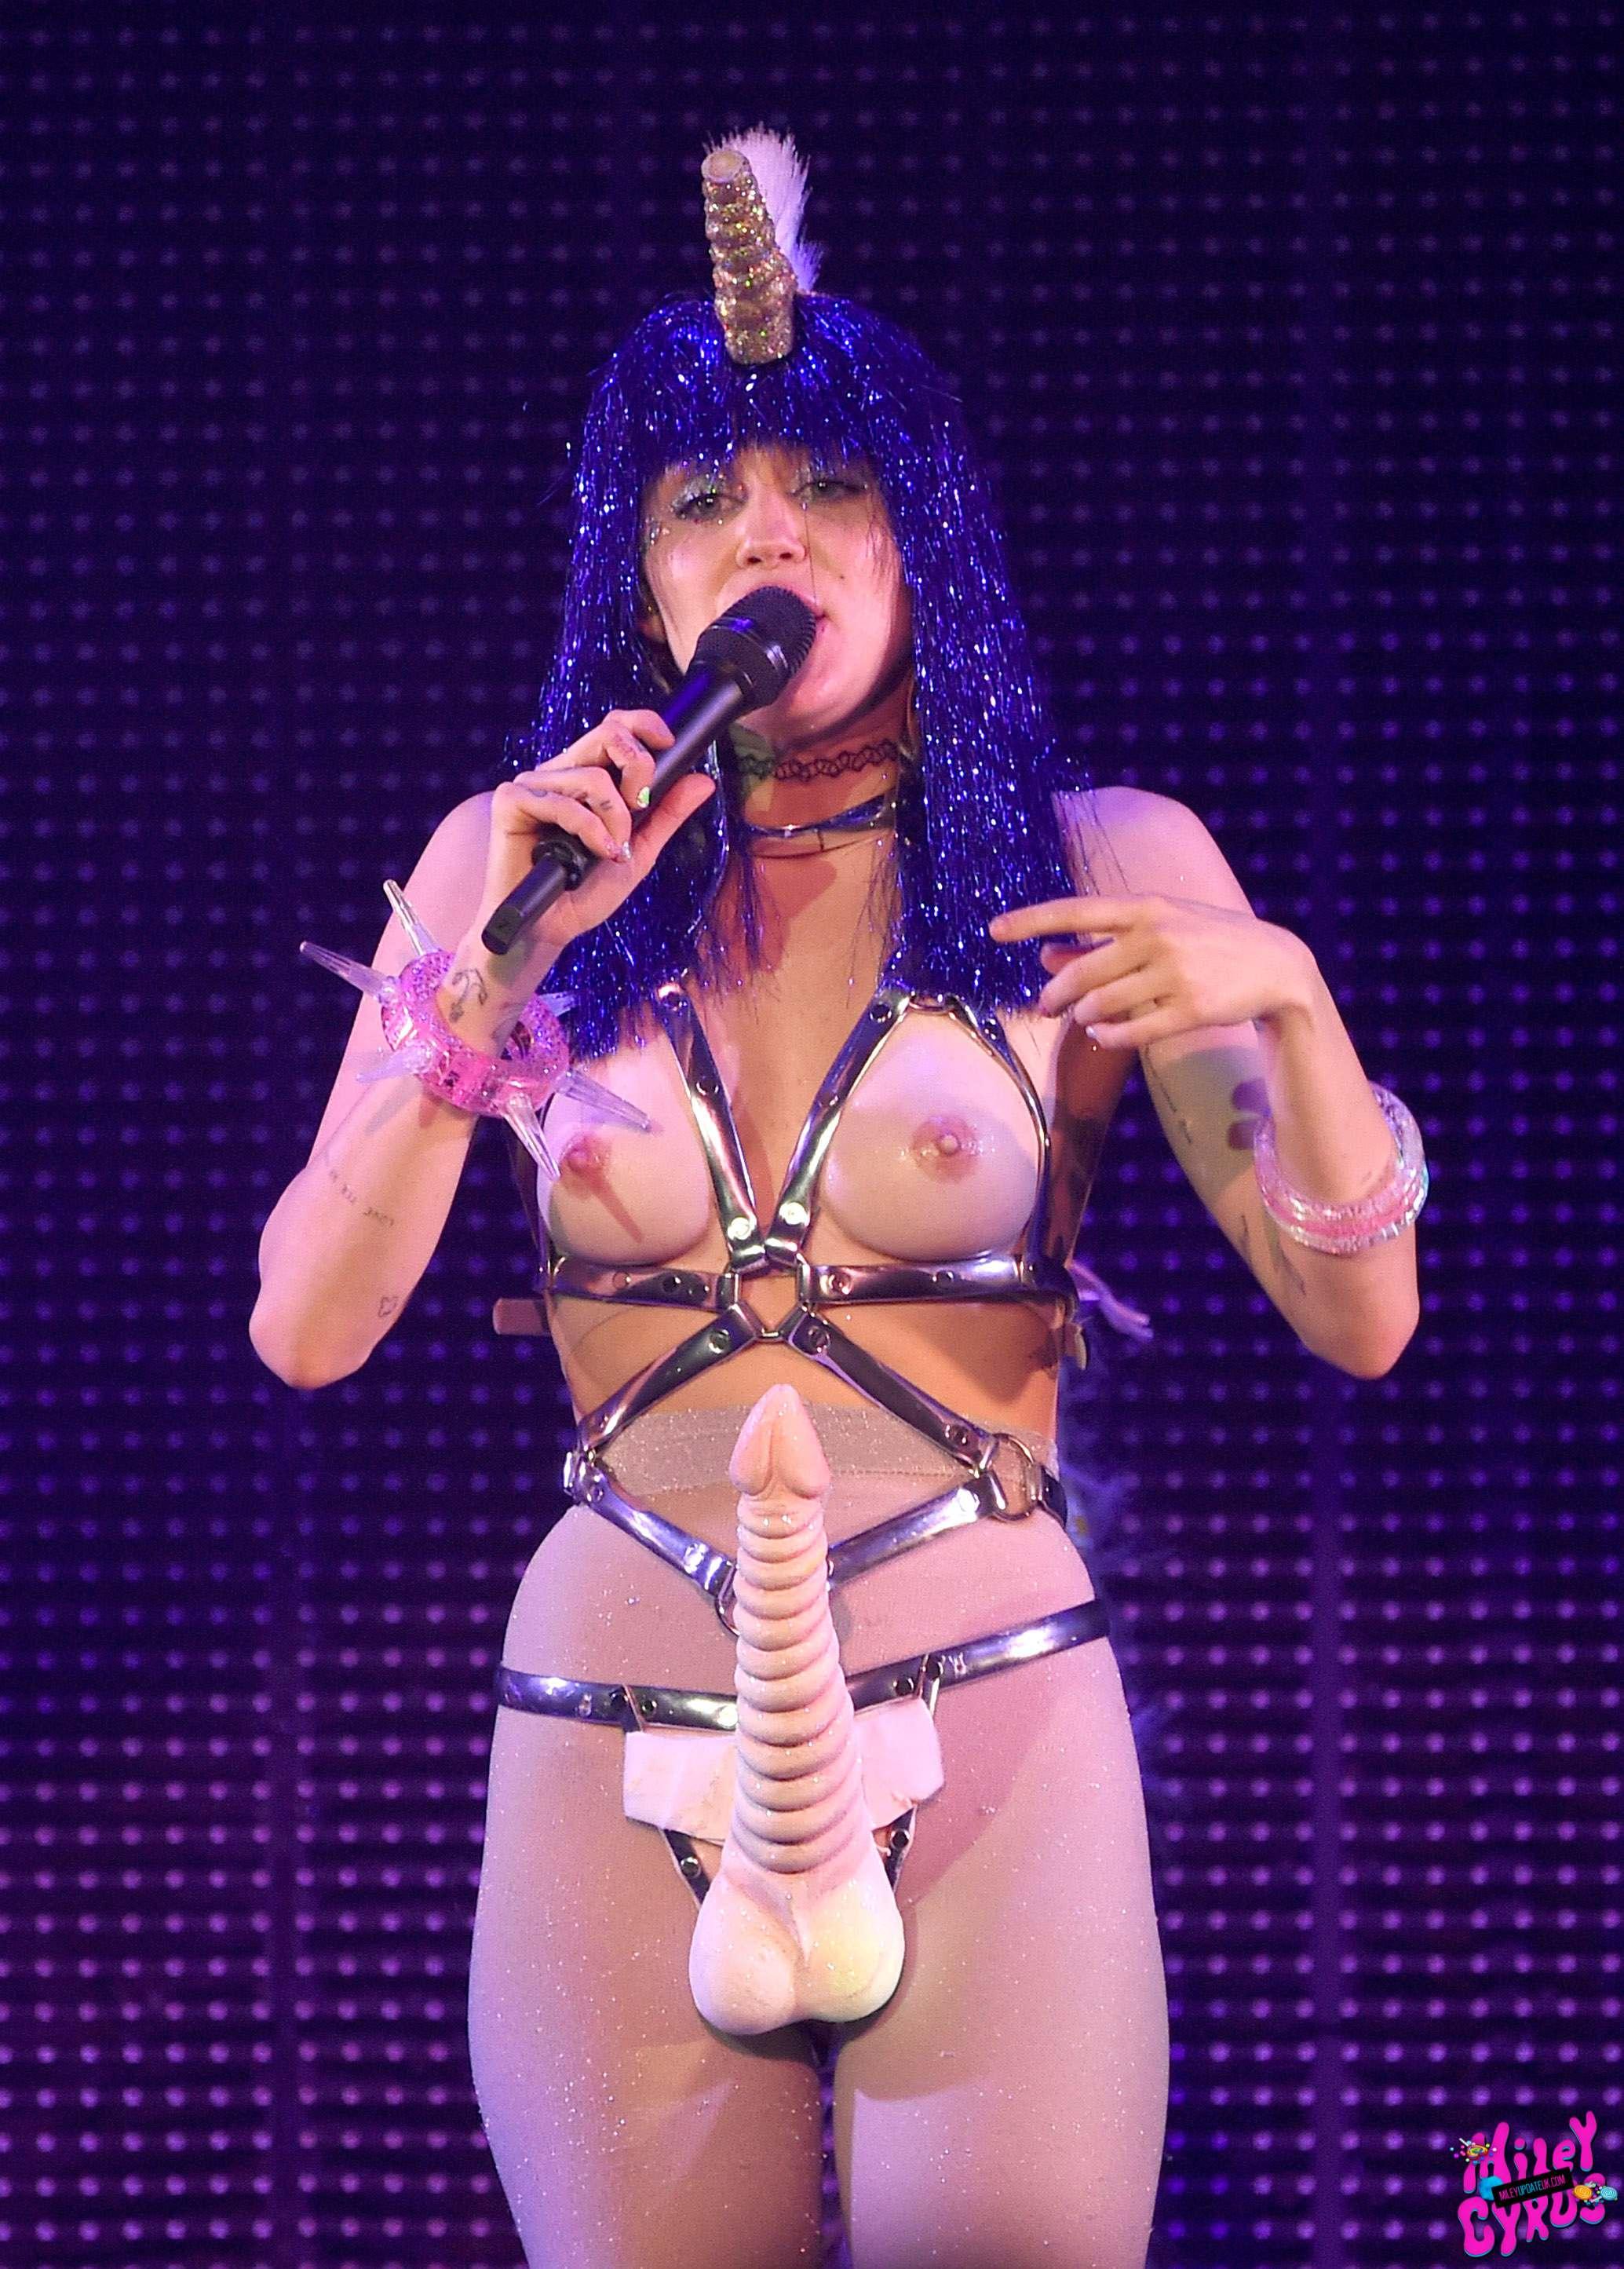 Miley-Cyrus-Sexy-Photos-10